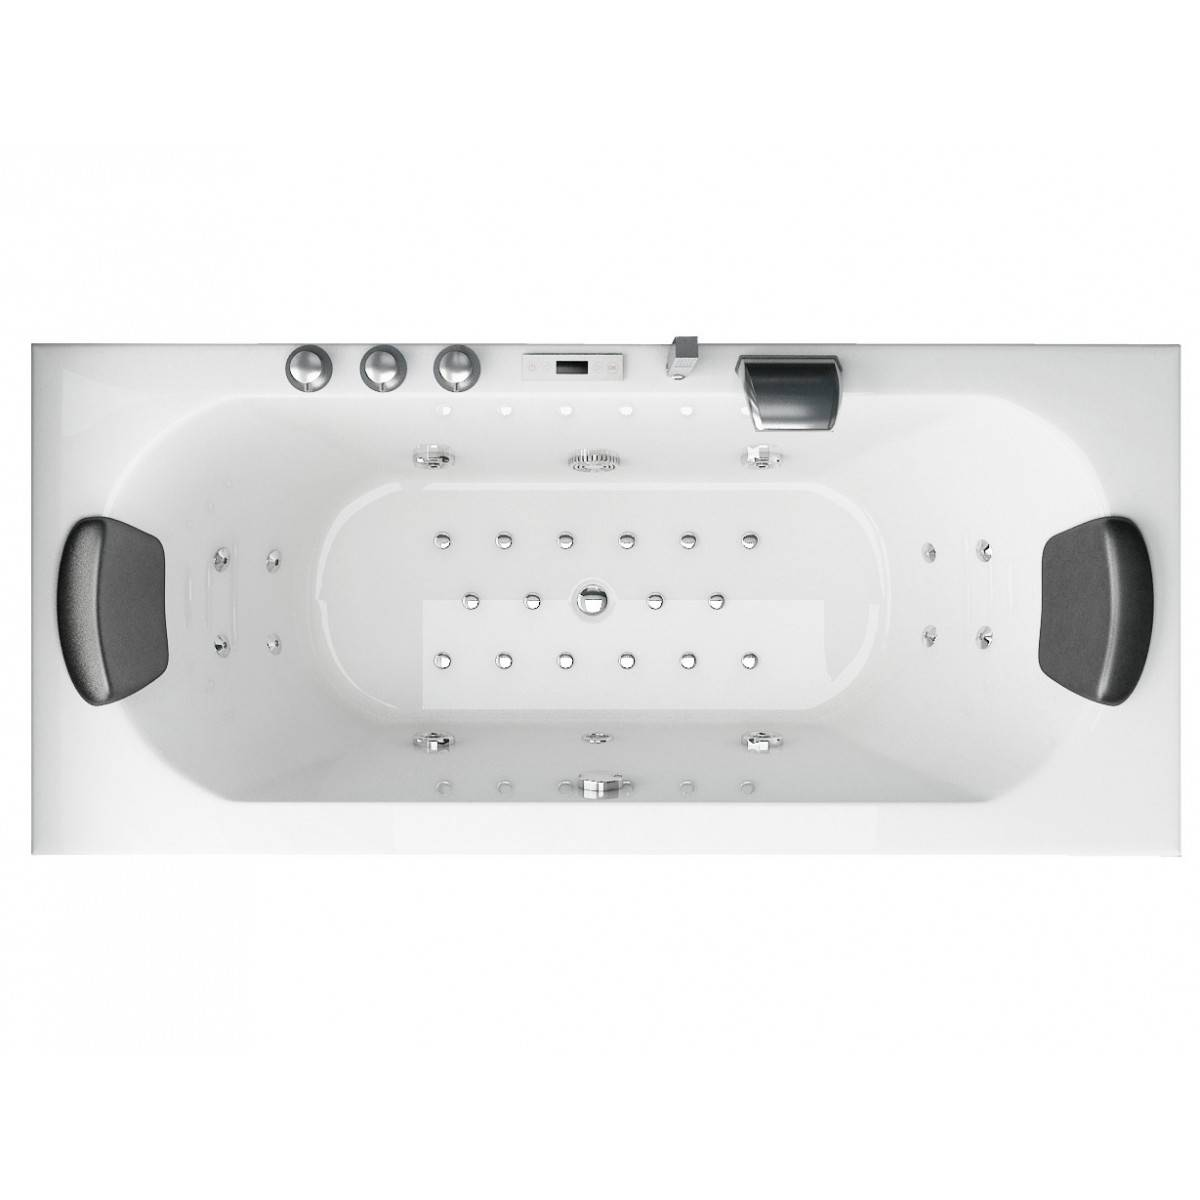 Spatec Whirlpools - Spatec Nova 150